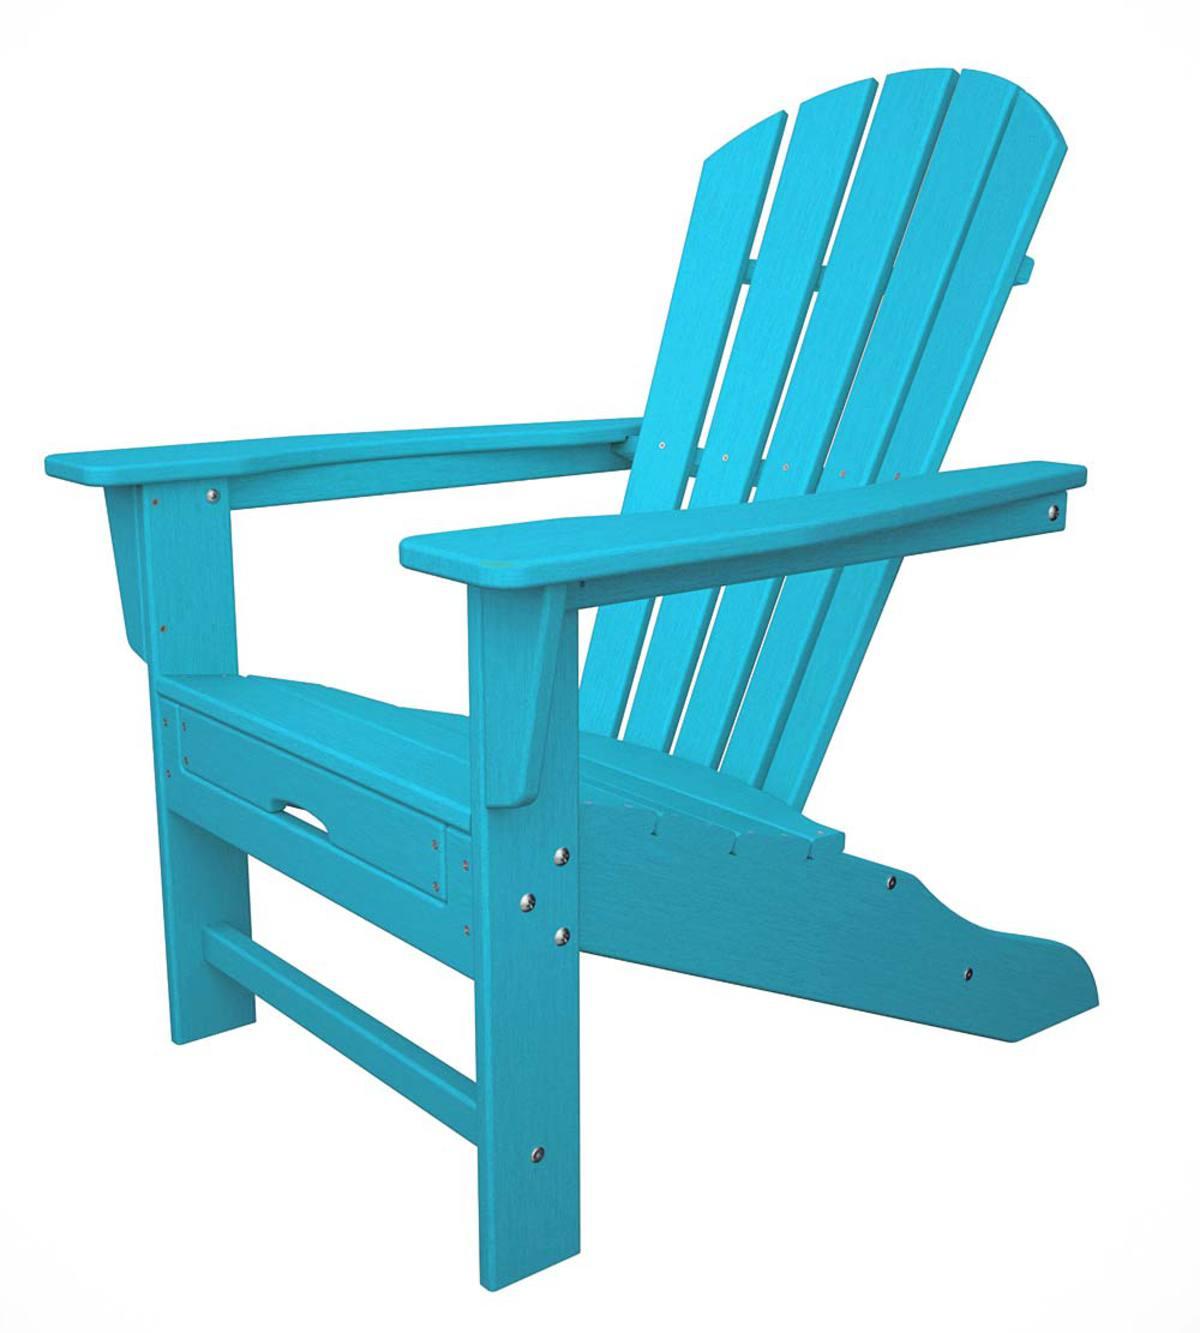 Polywood Adirondack Chair With Hideaway Ottoman Plowhearth